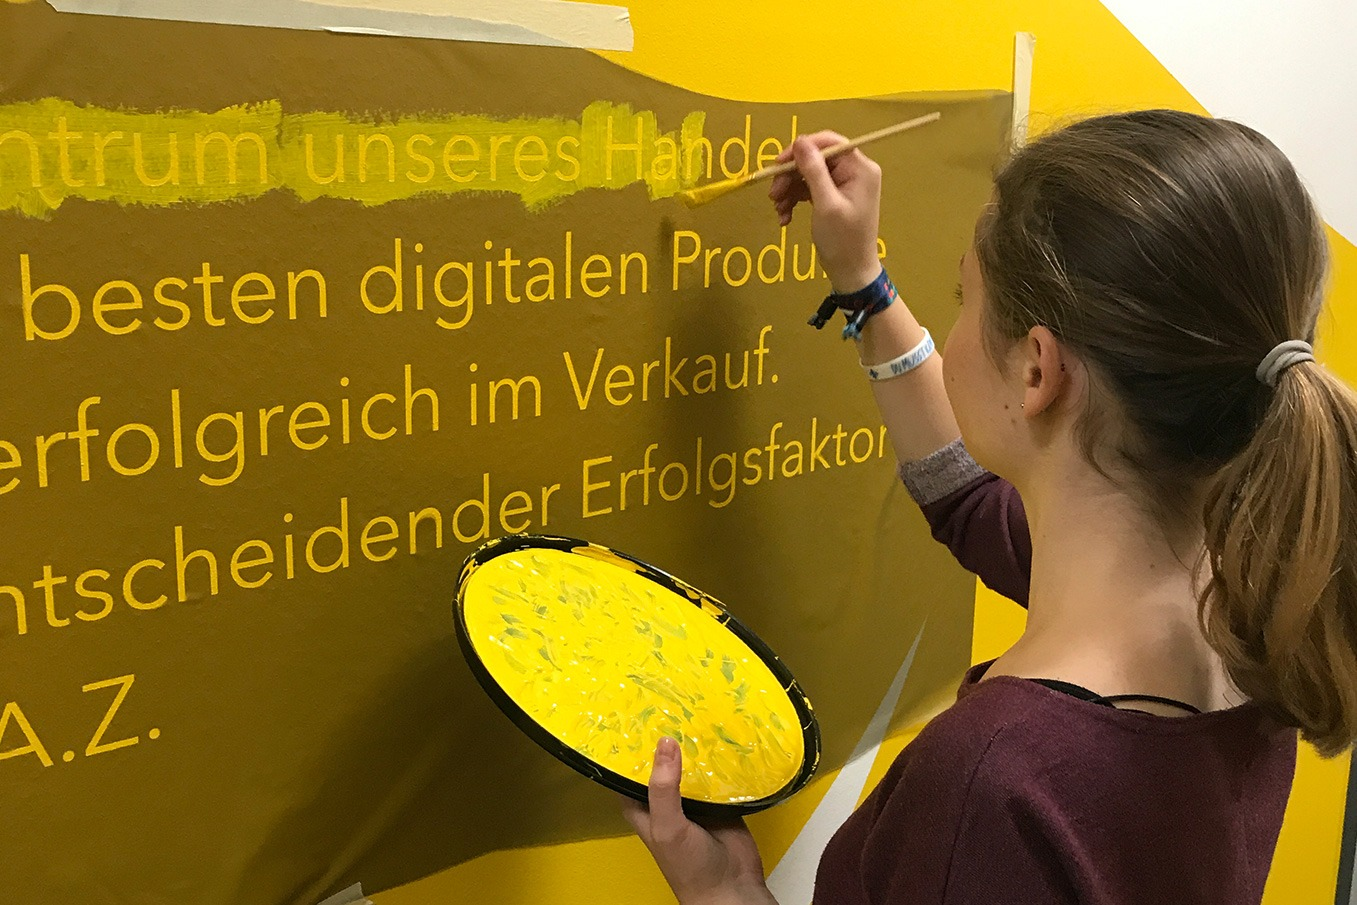 graffitiauftrag-graffitikuenstler-artmos4-FAZ_Frankfurt_2017_schrift_buchstaben_typo_grafisch_Leinwand_gelb_weiss_folie_medien